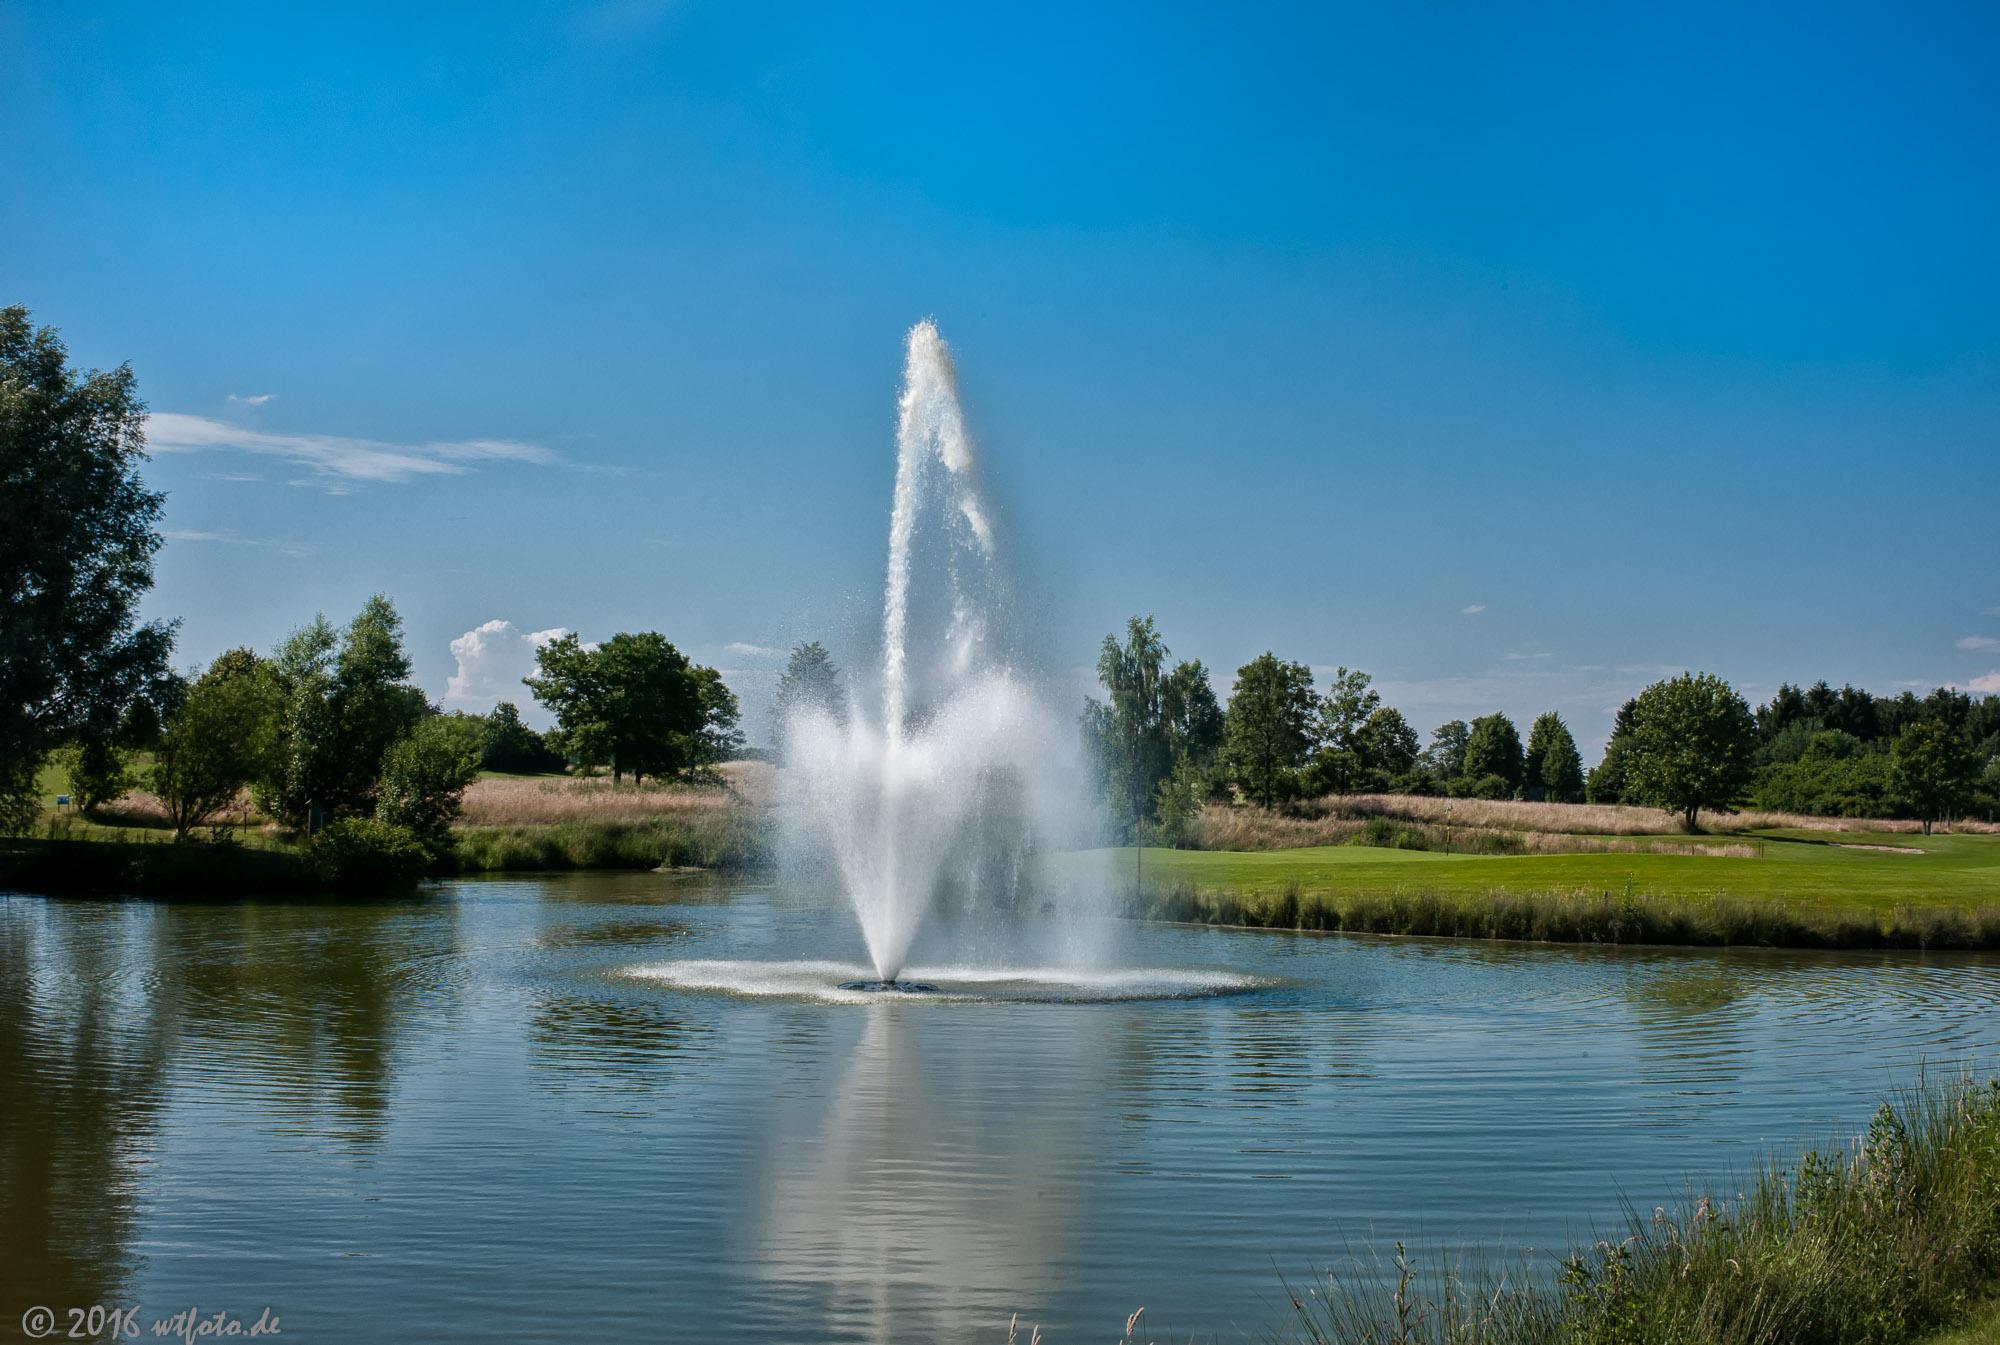 Fontaine an Grün 6 - 9